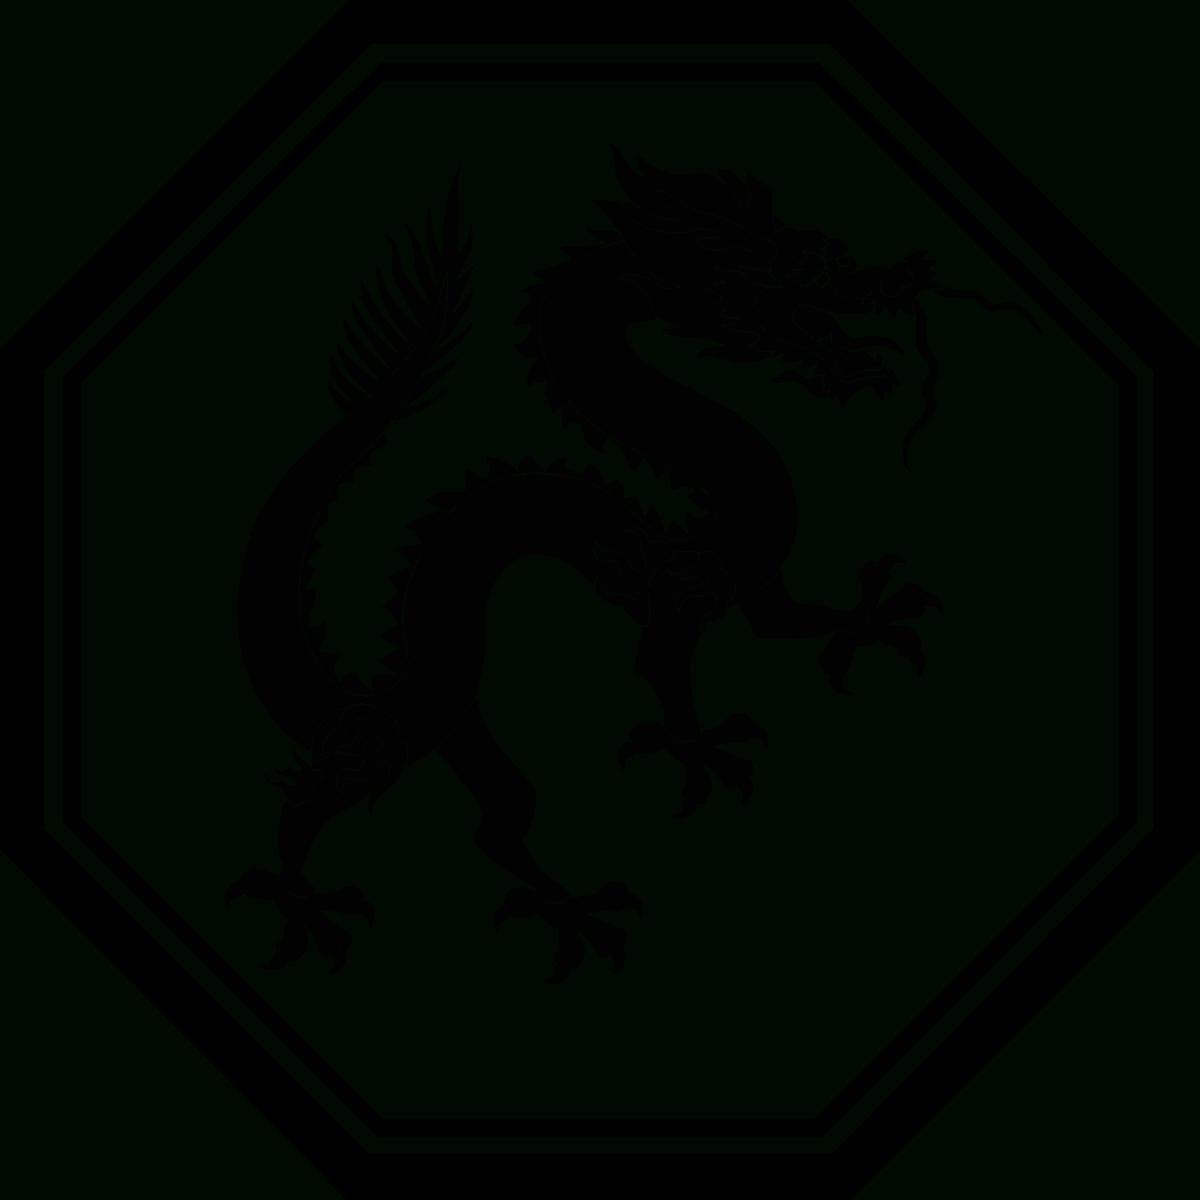 Dragon (Zodiac) - Wikipedia